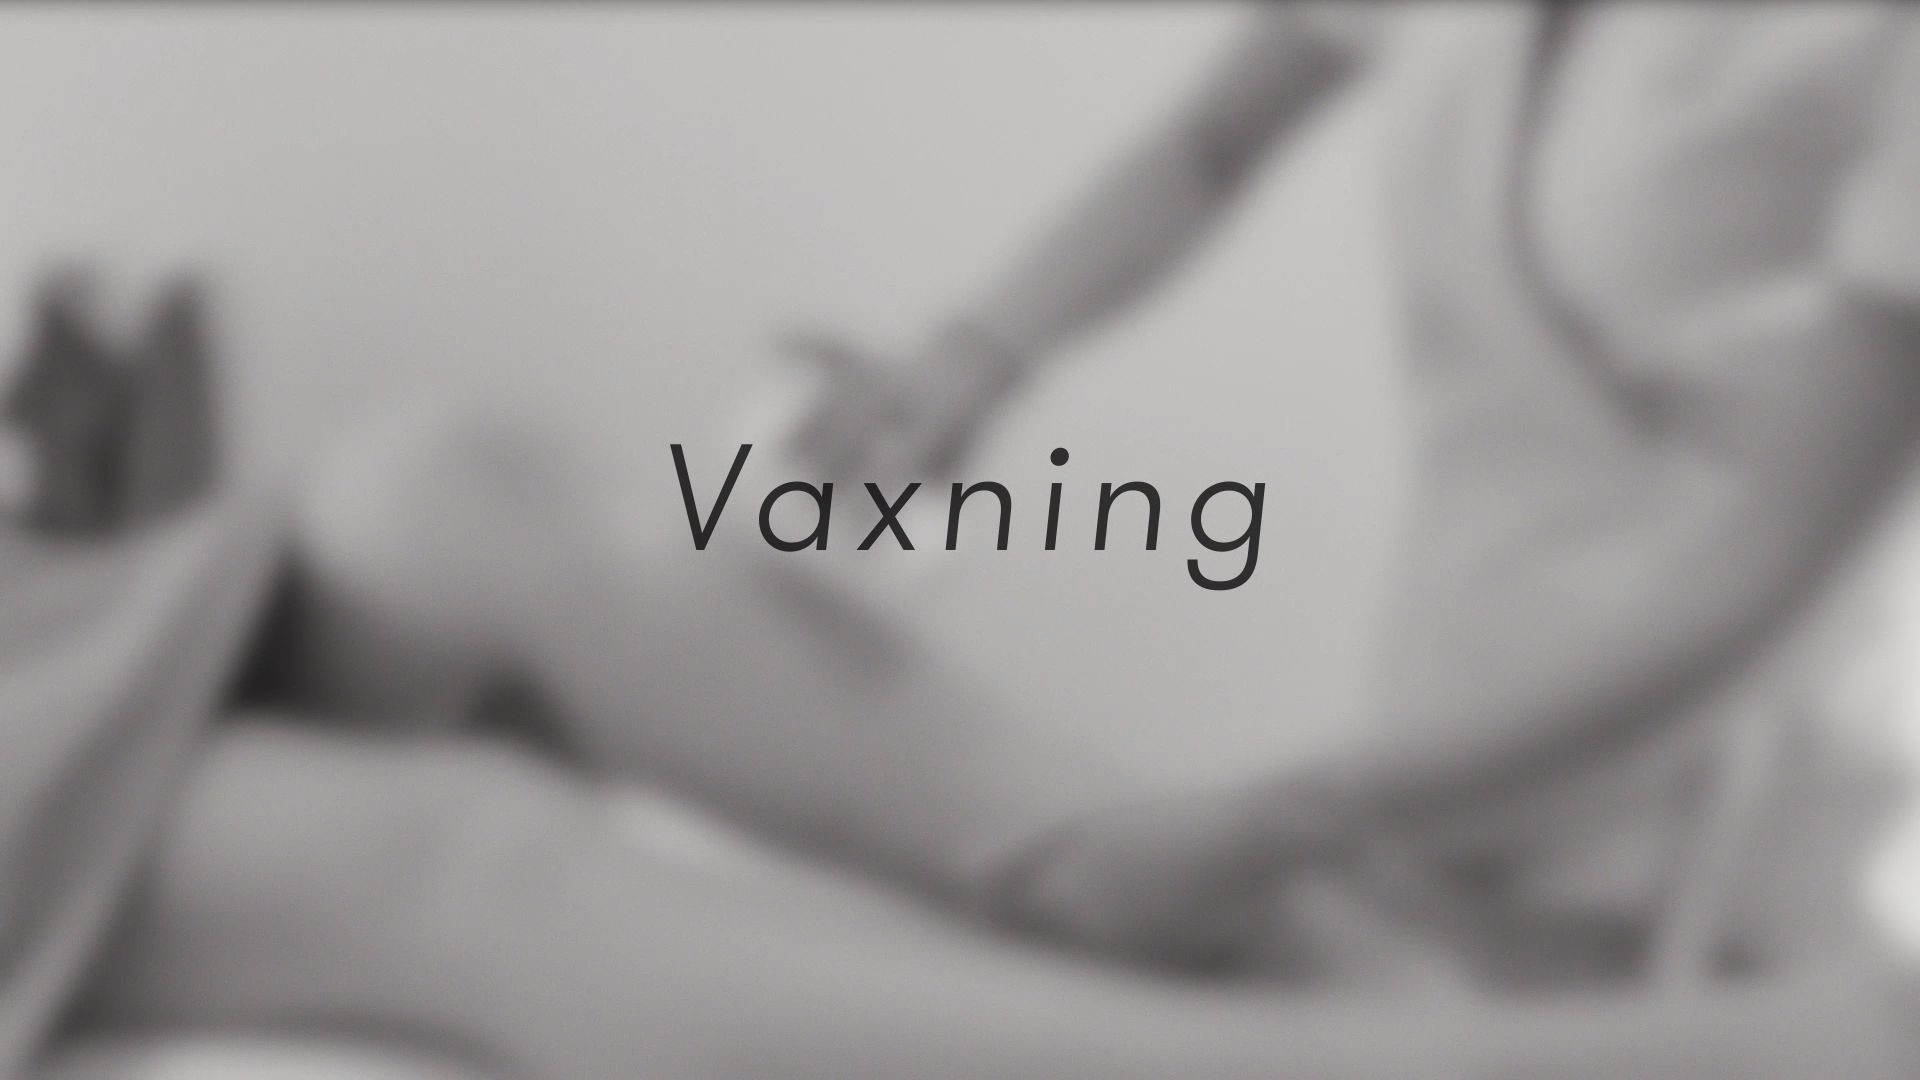 brasiliansk vaxning vasastan